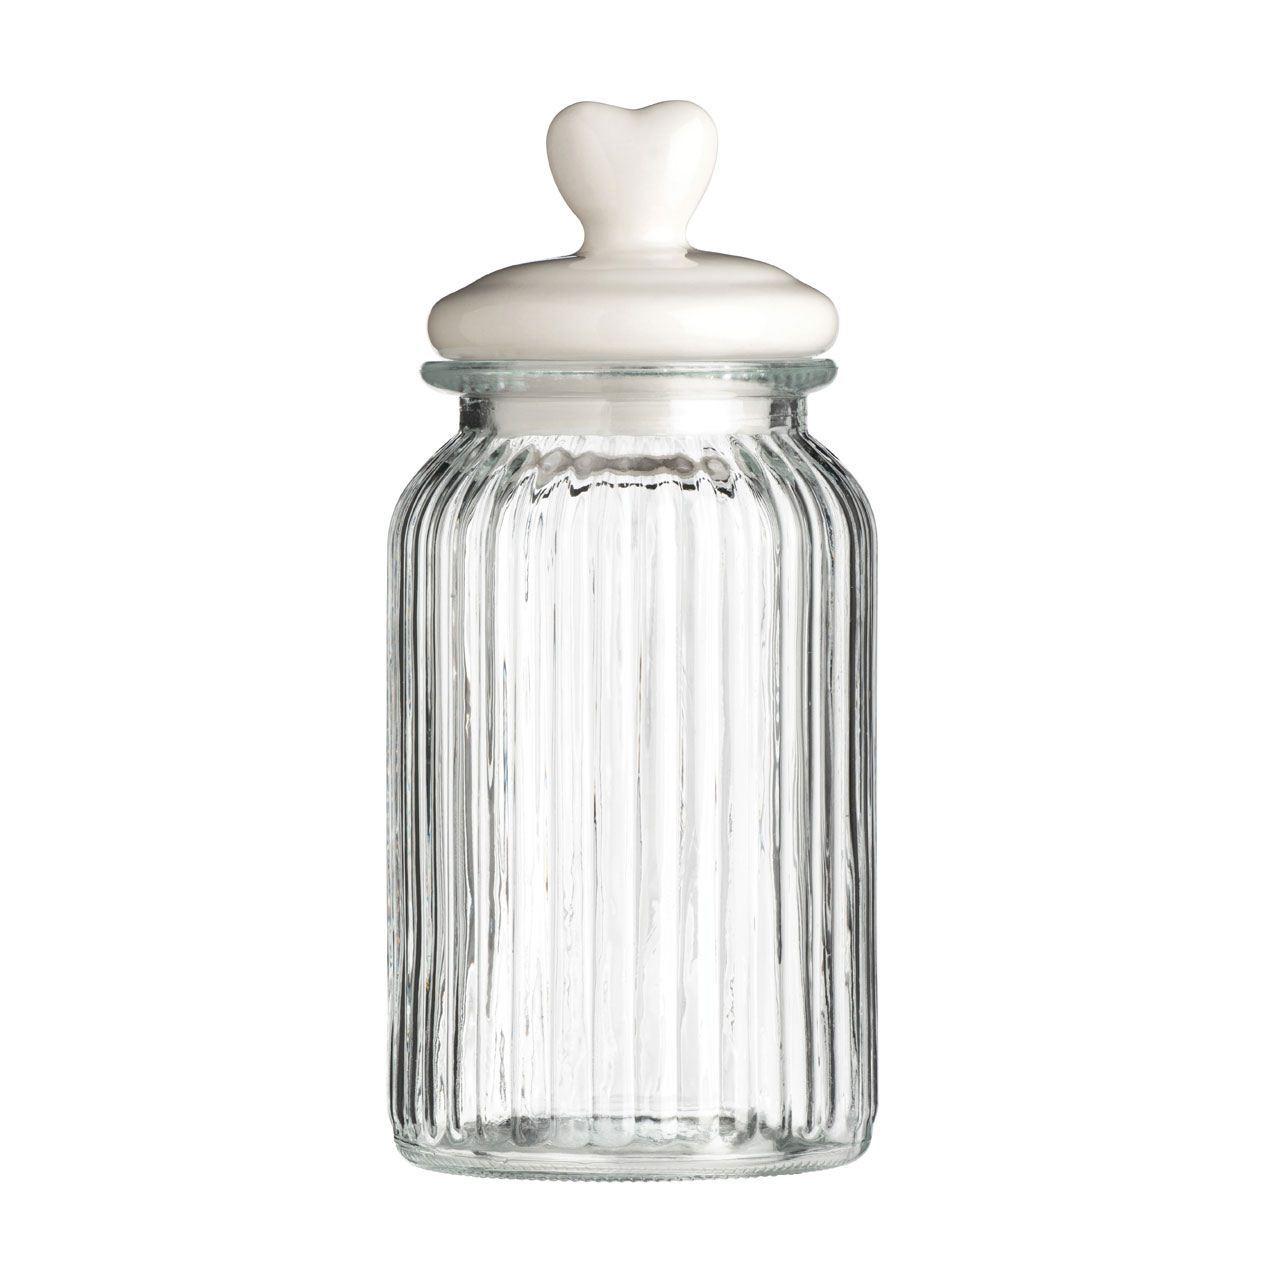 ribbed glass heart design lid kitchen storage canister jar kitchen organization with pantry storage jars hometalk